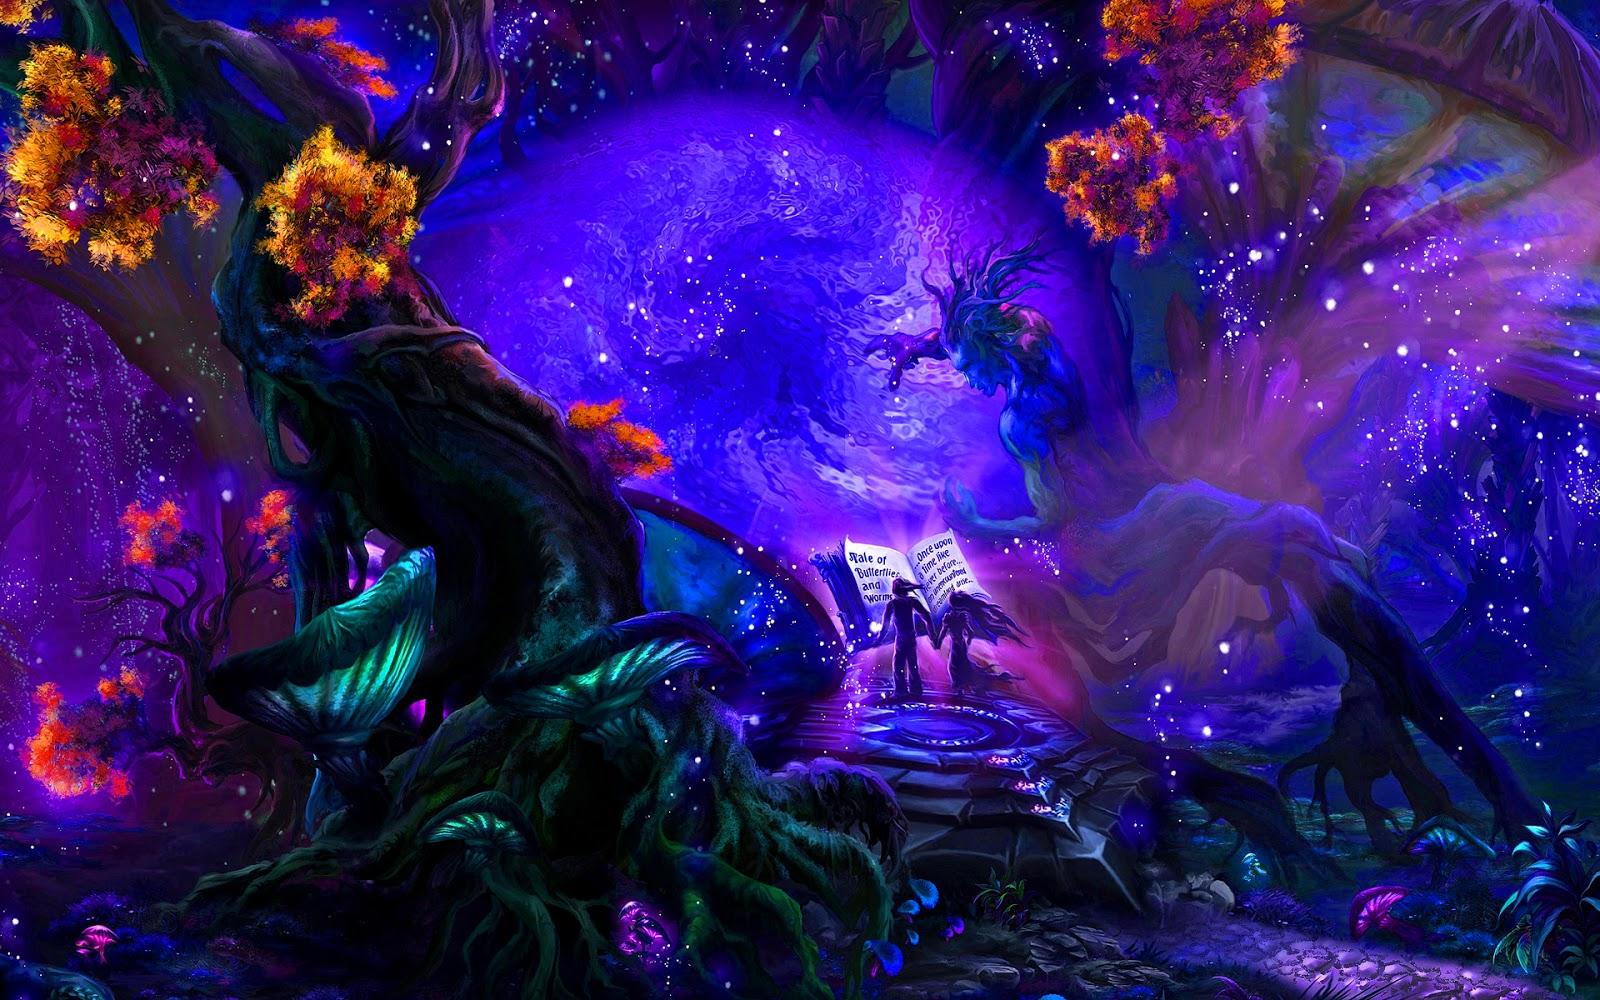 Girl fairy tale dream girl 4